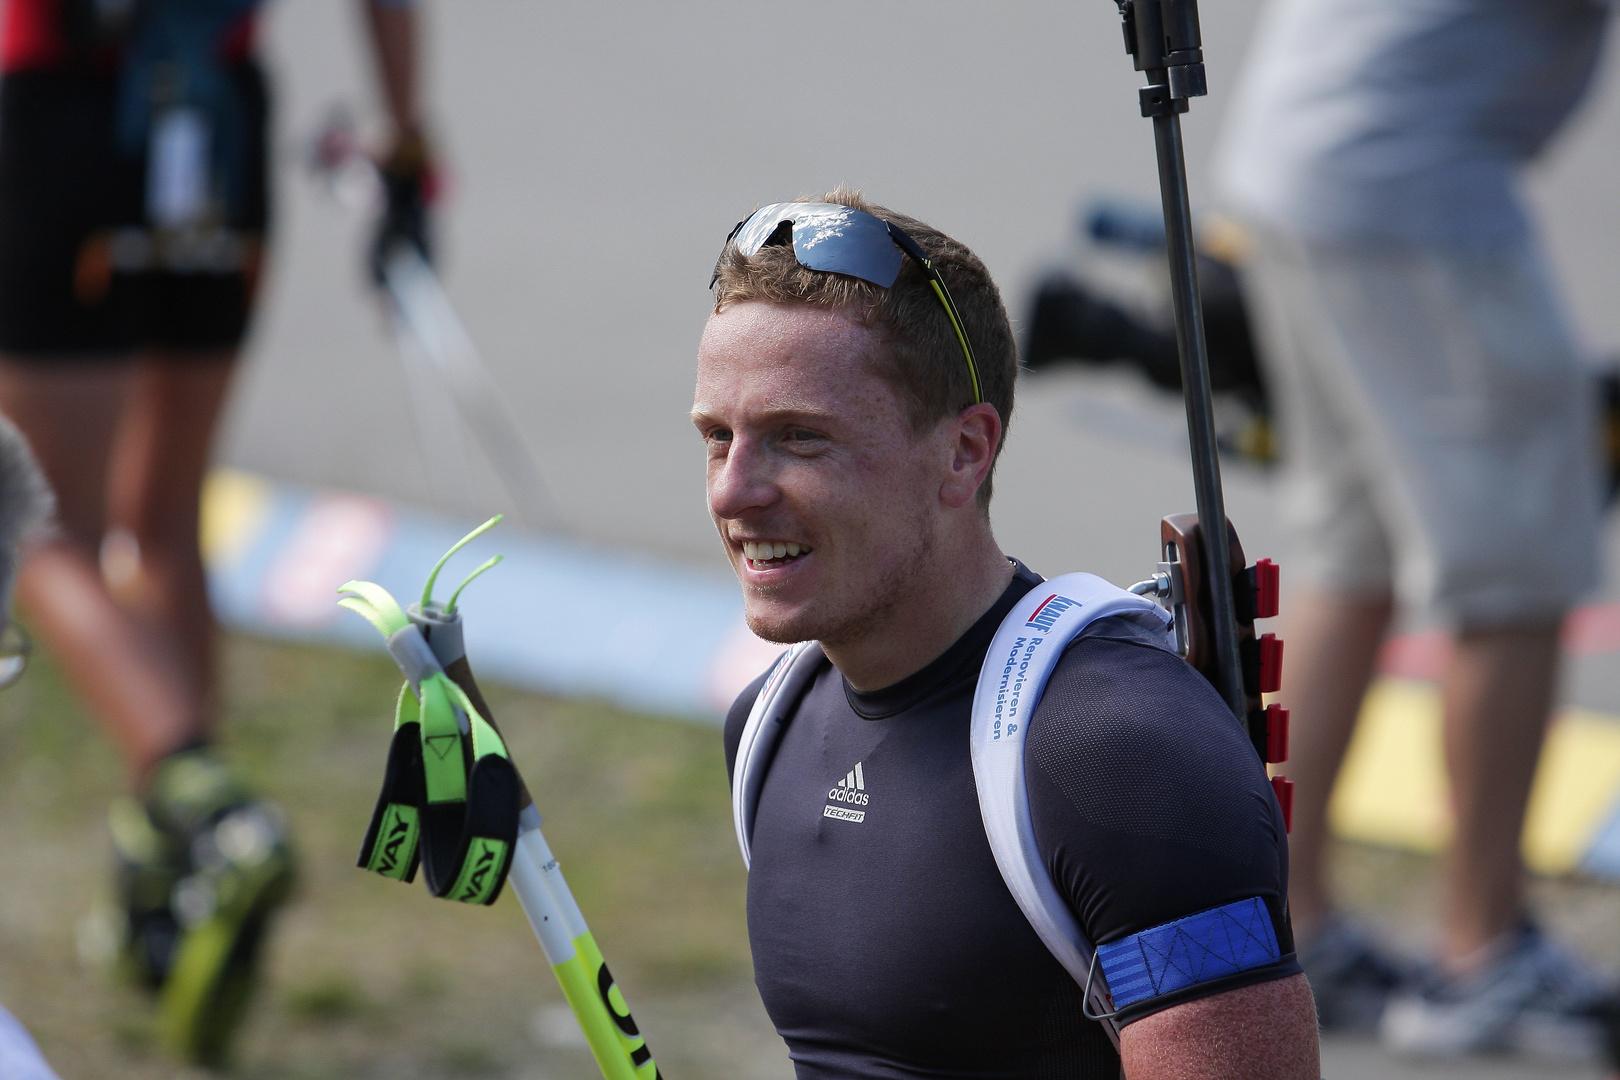 Florian Graf 2